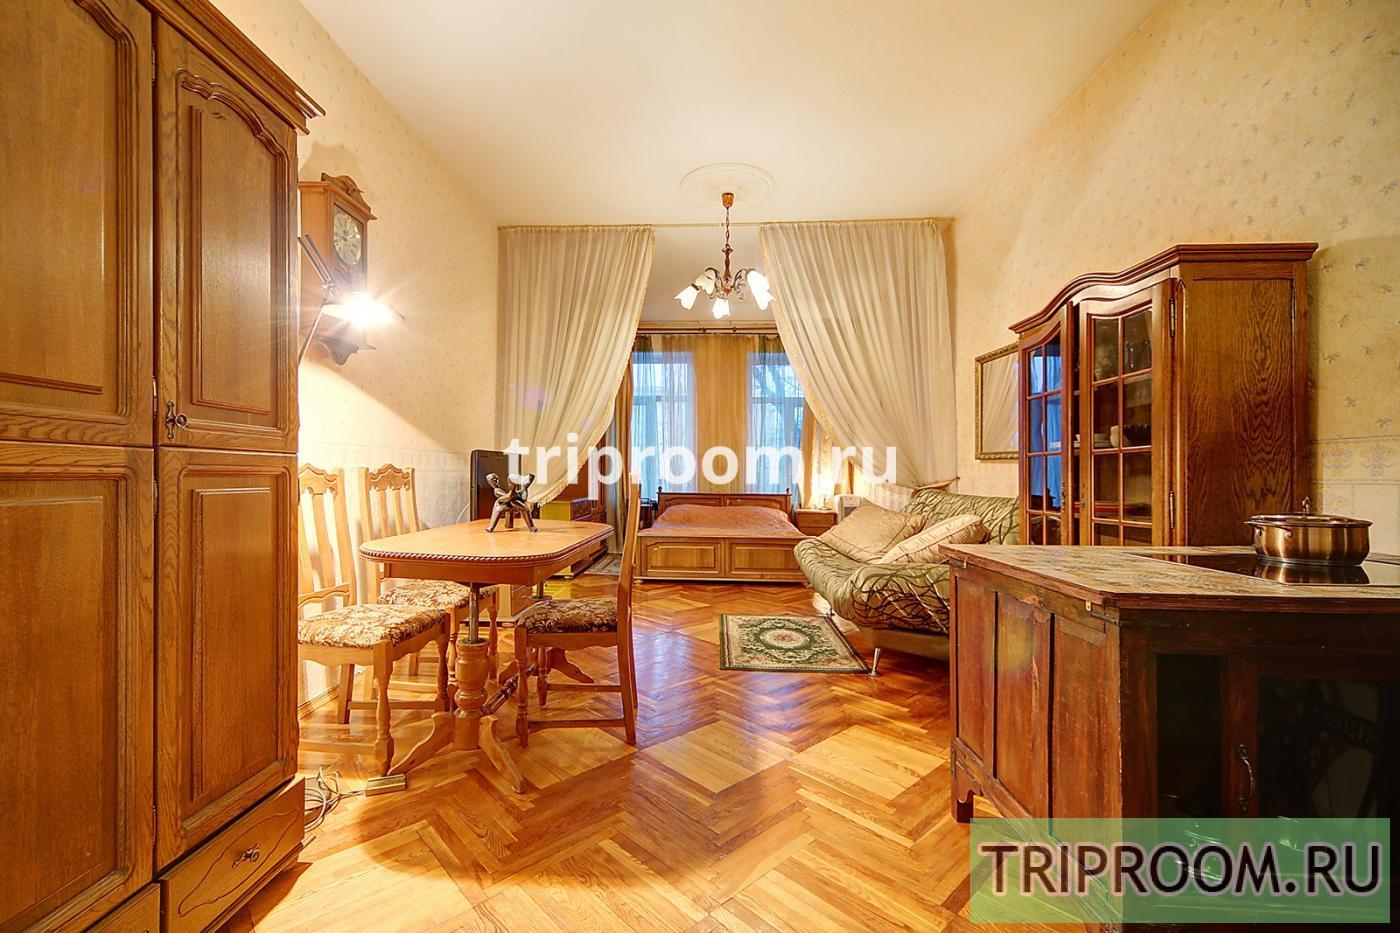 1-комнатная квартира посуточно (вариант № 15445), ул. Лиговский проспект, фото № 10